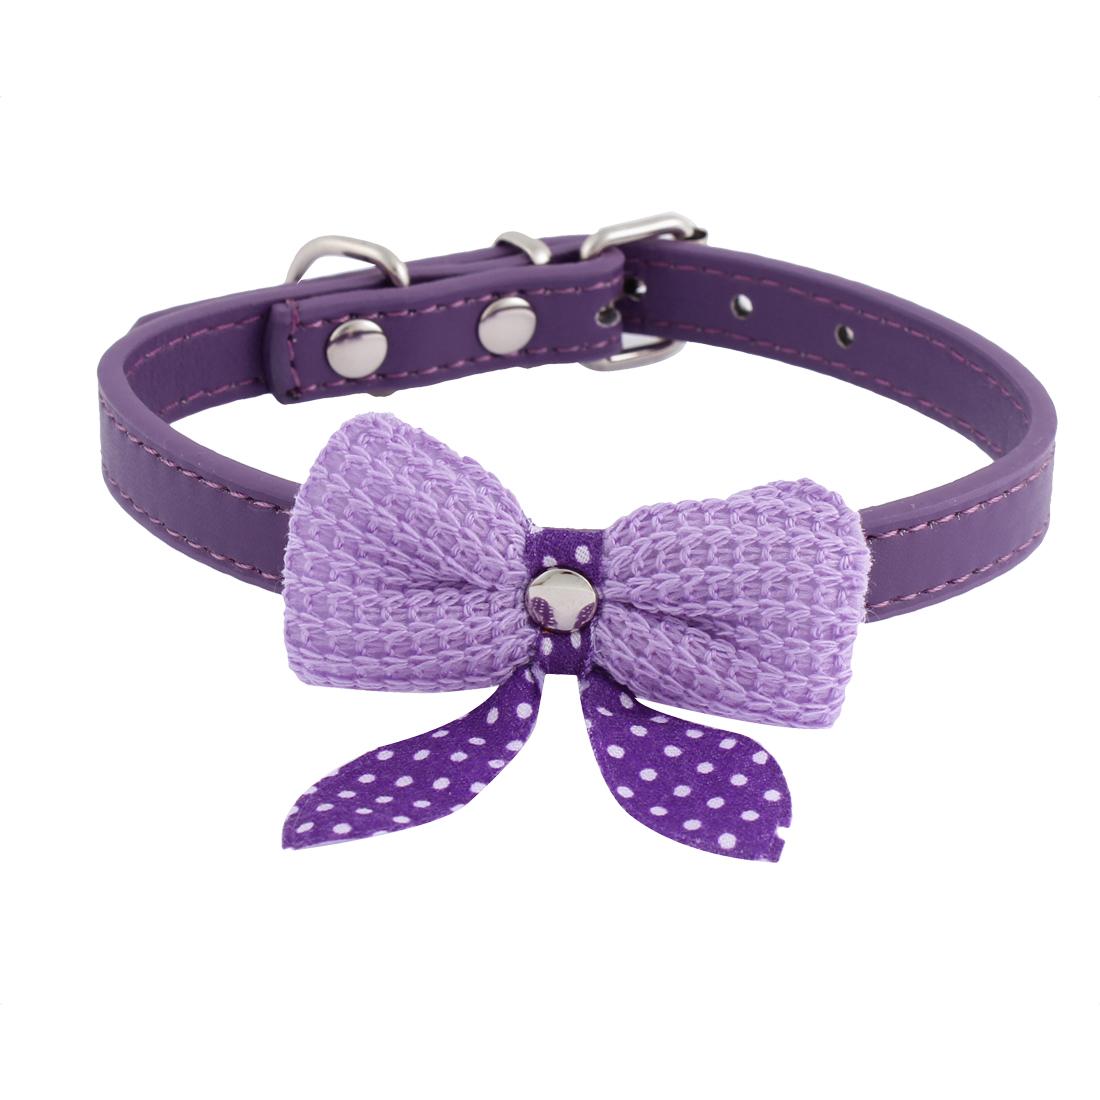 Single Pin Buckle Bow Bowknot Detail Pet Dog Kitty Collar 27-33cm Purple